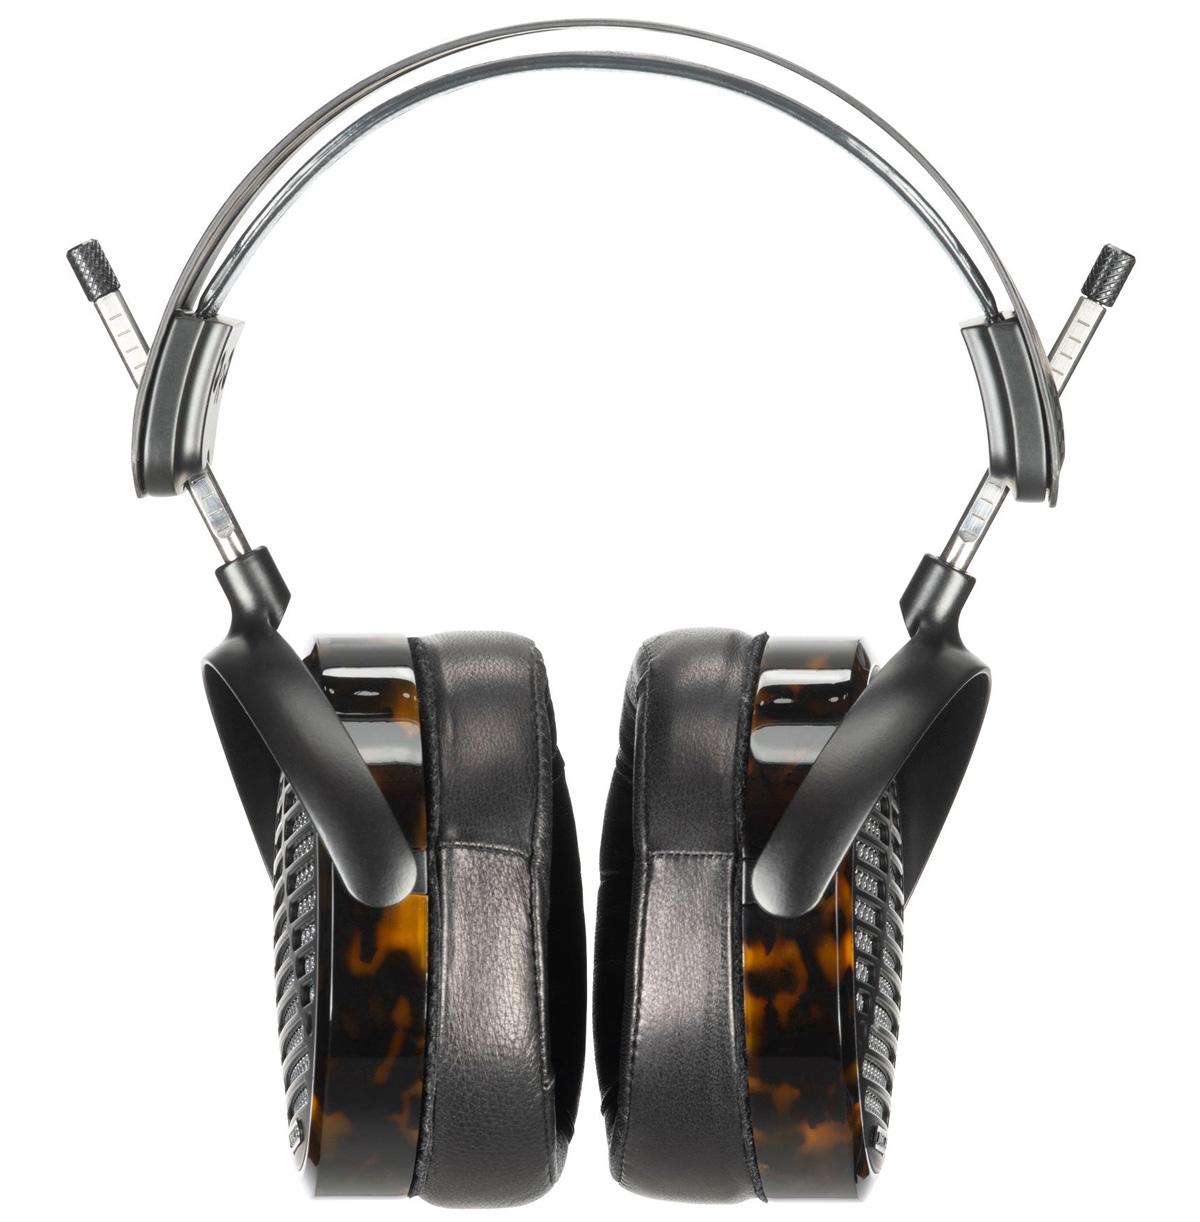 Audeze LCD-5 Audio Venue